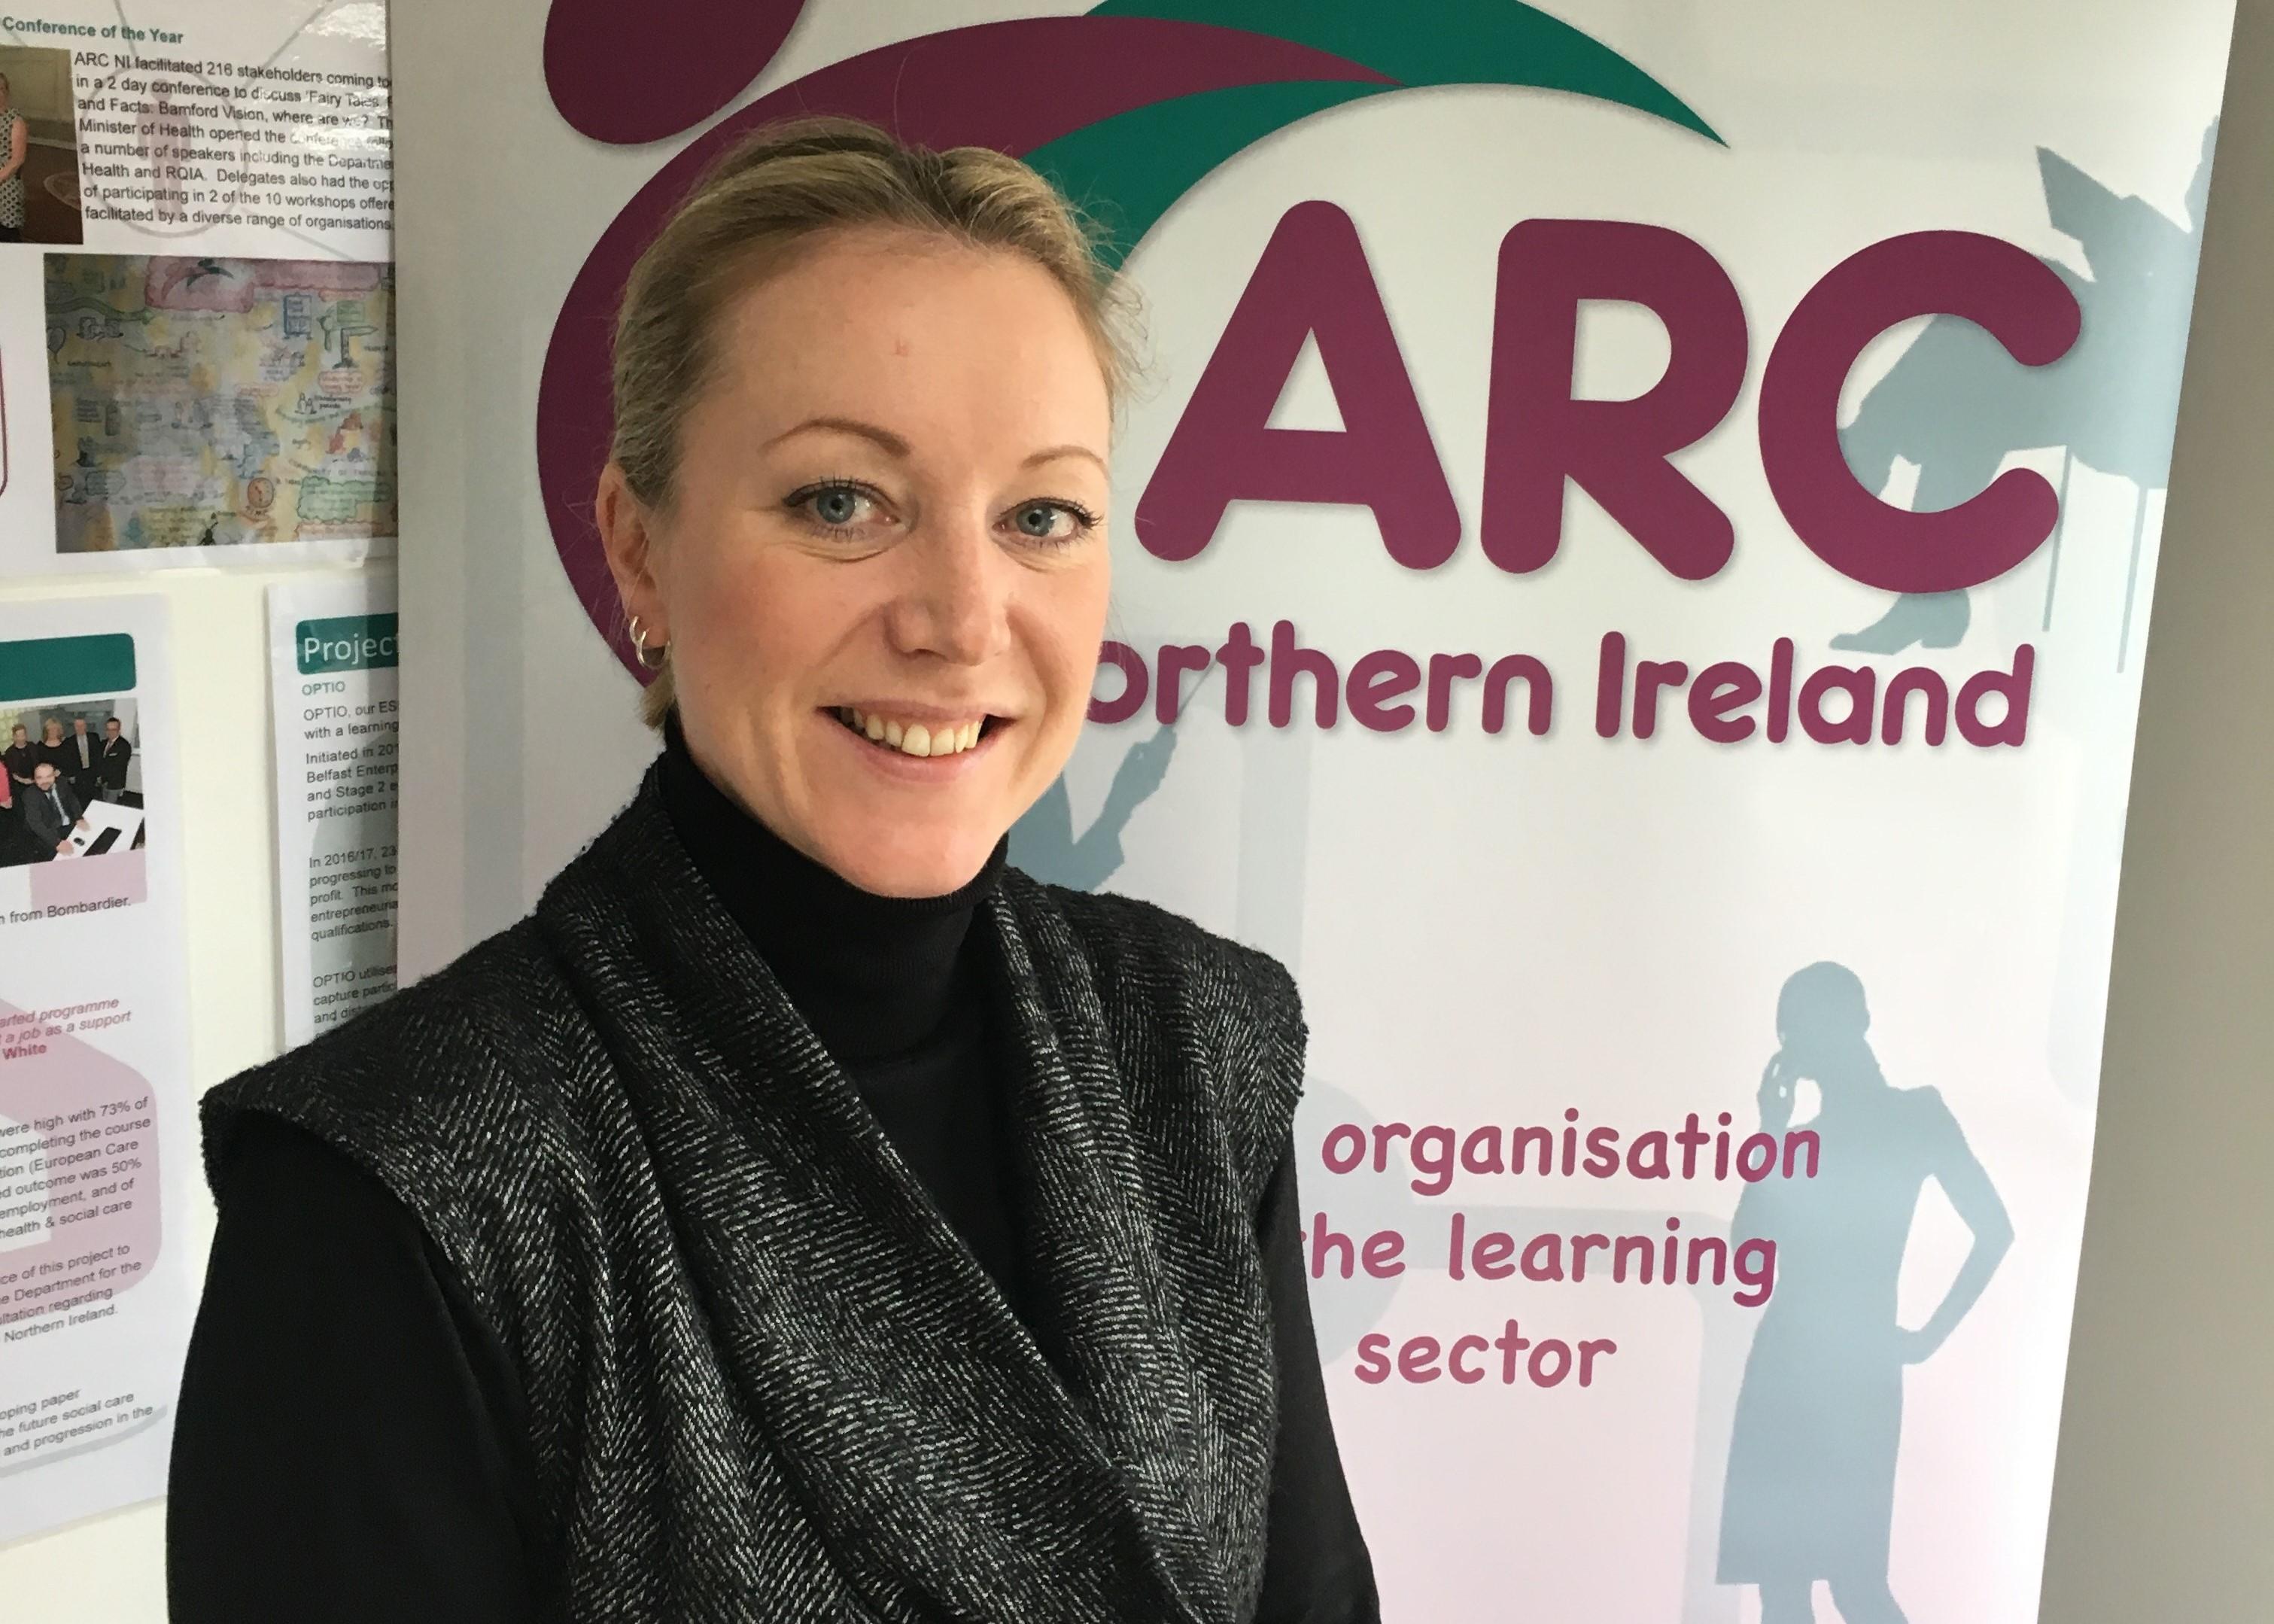 National Learning Disability Awards Arc Northern Ireland Support The National Learning Disabilities Autism Awards 2018